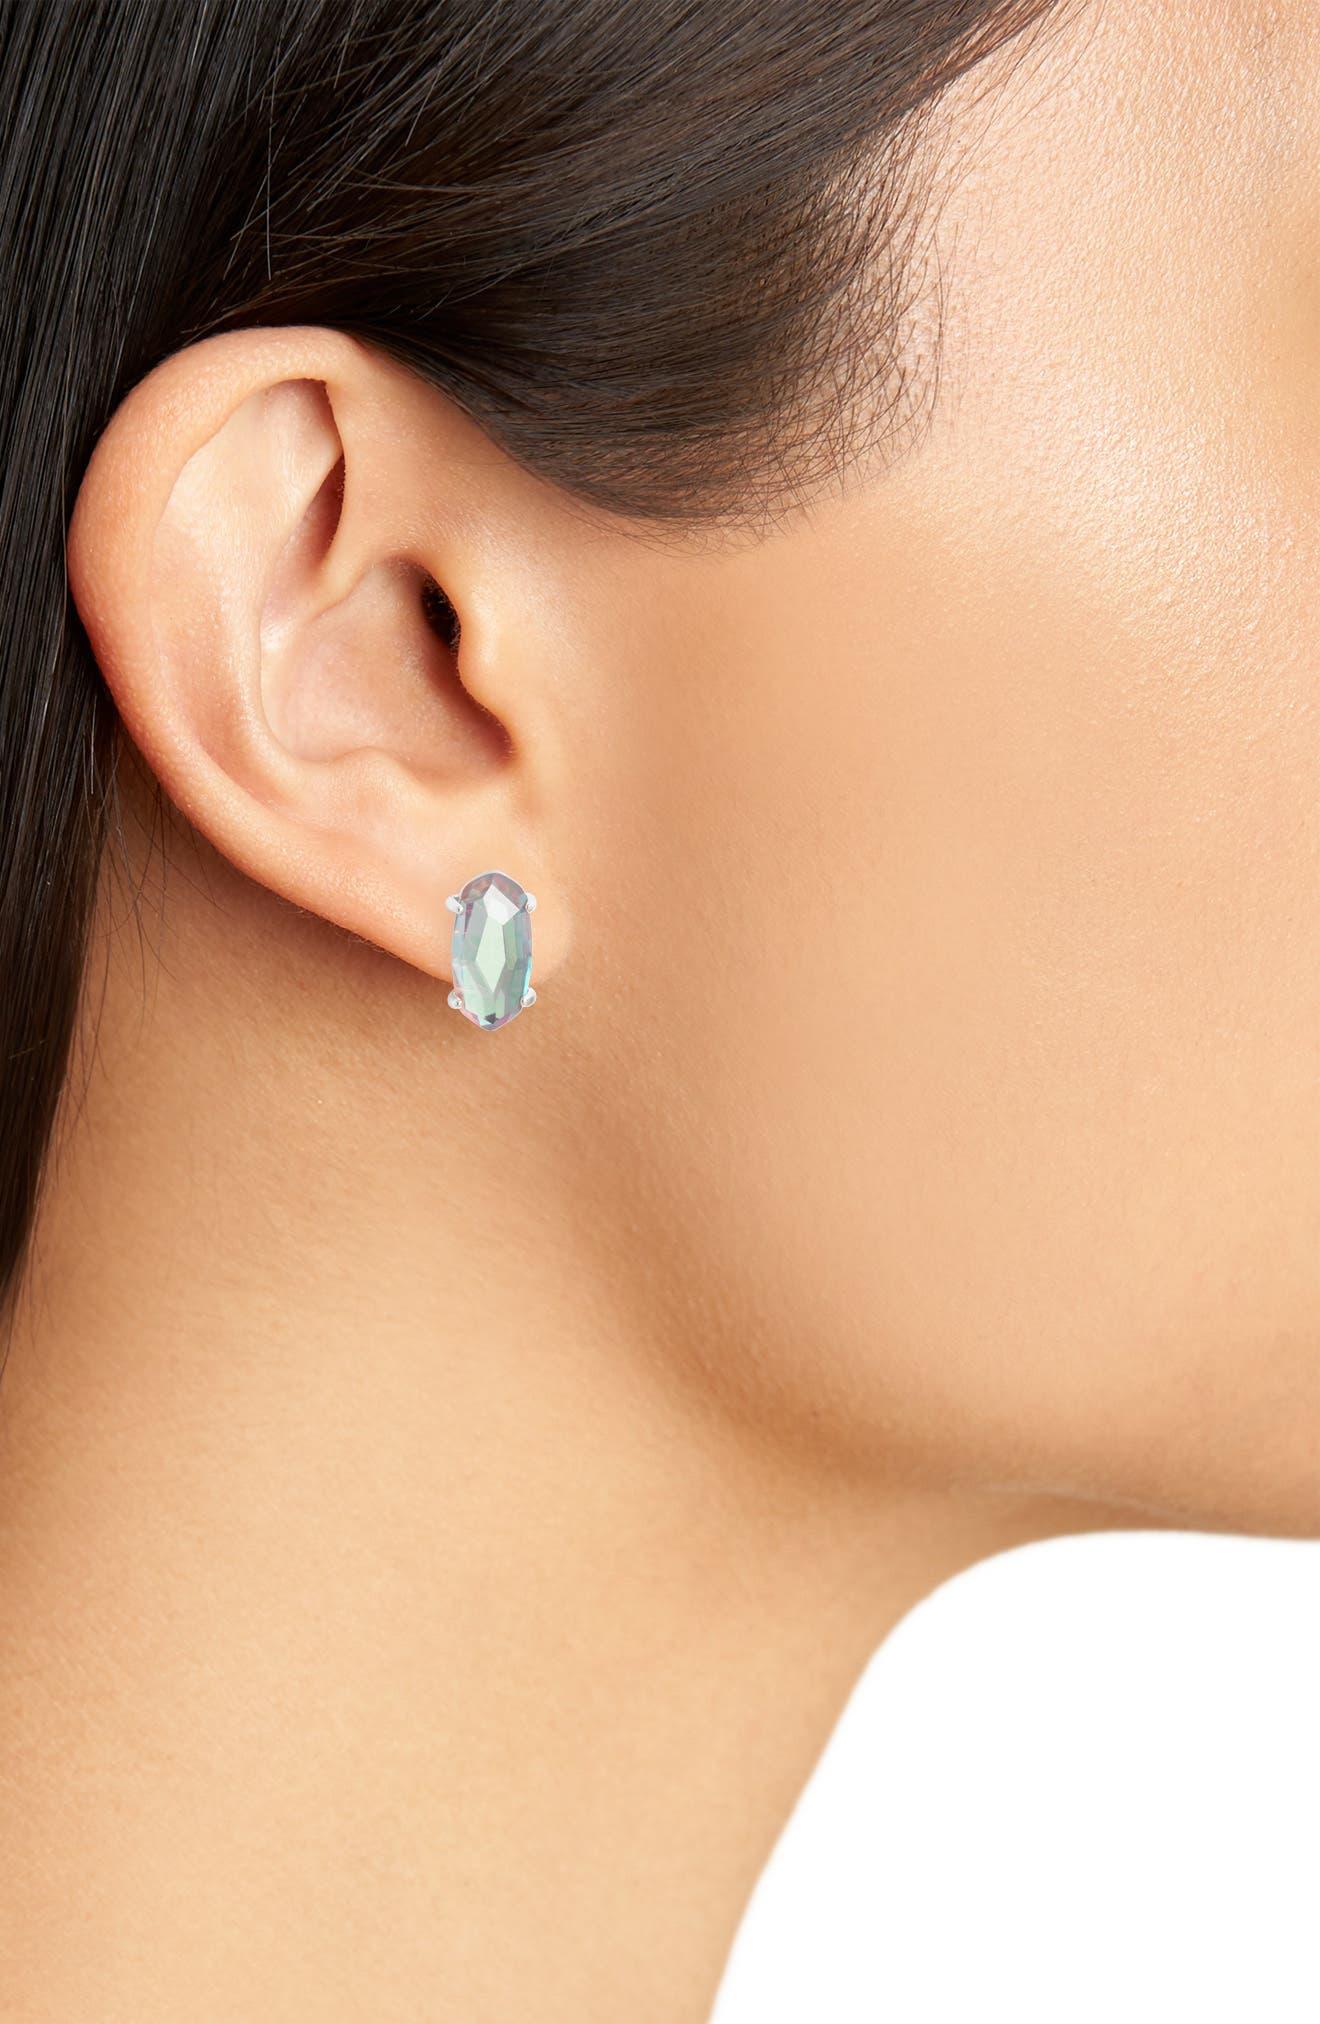 KENDRA SCOTT, Betty Stud Earrings, Alternate thumbnail 2, color, GRAY DICHROIC GLASS/ SILVER